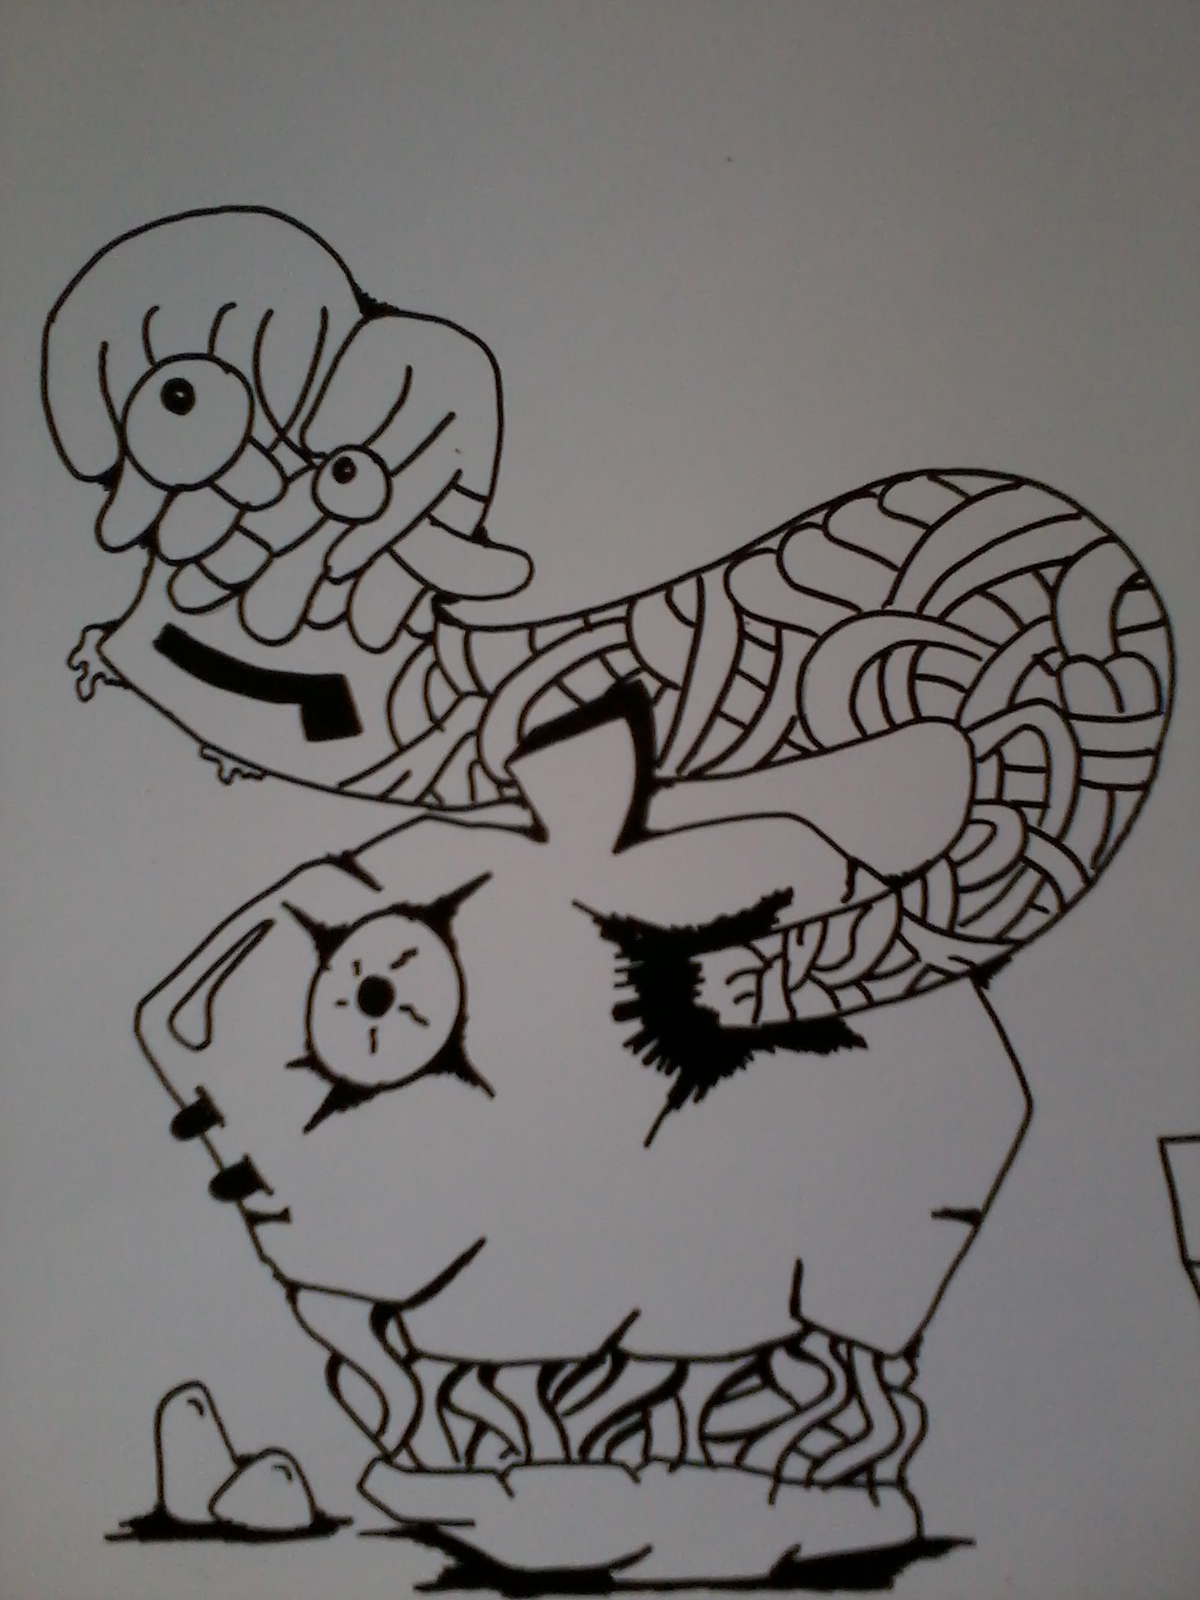 Kumpulan Gambar Sketsa Monster